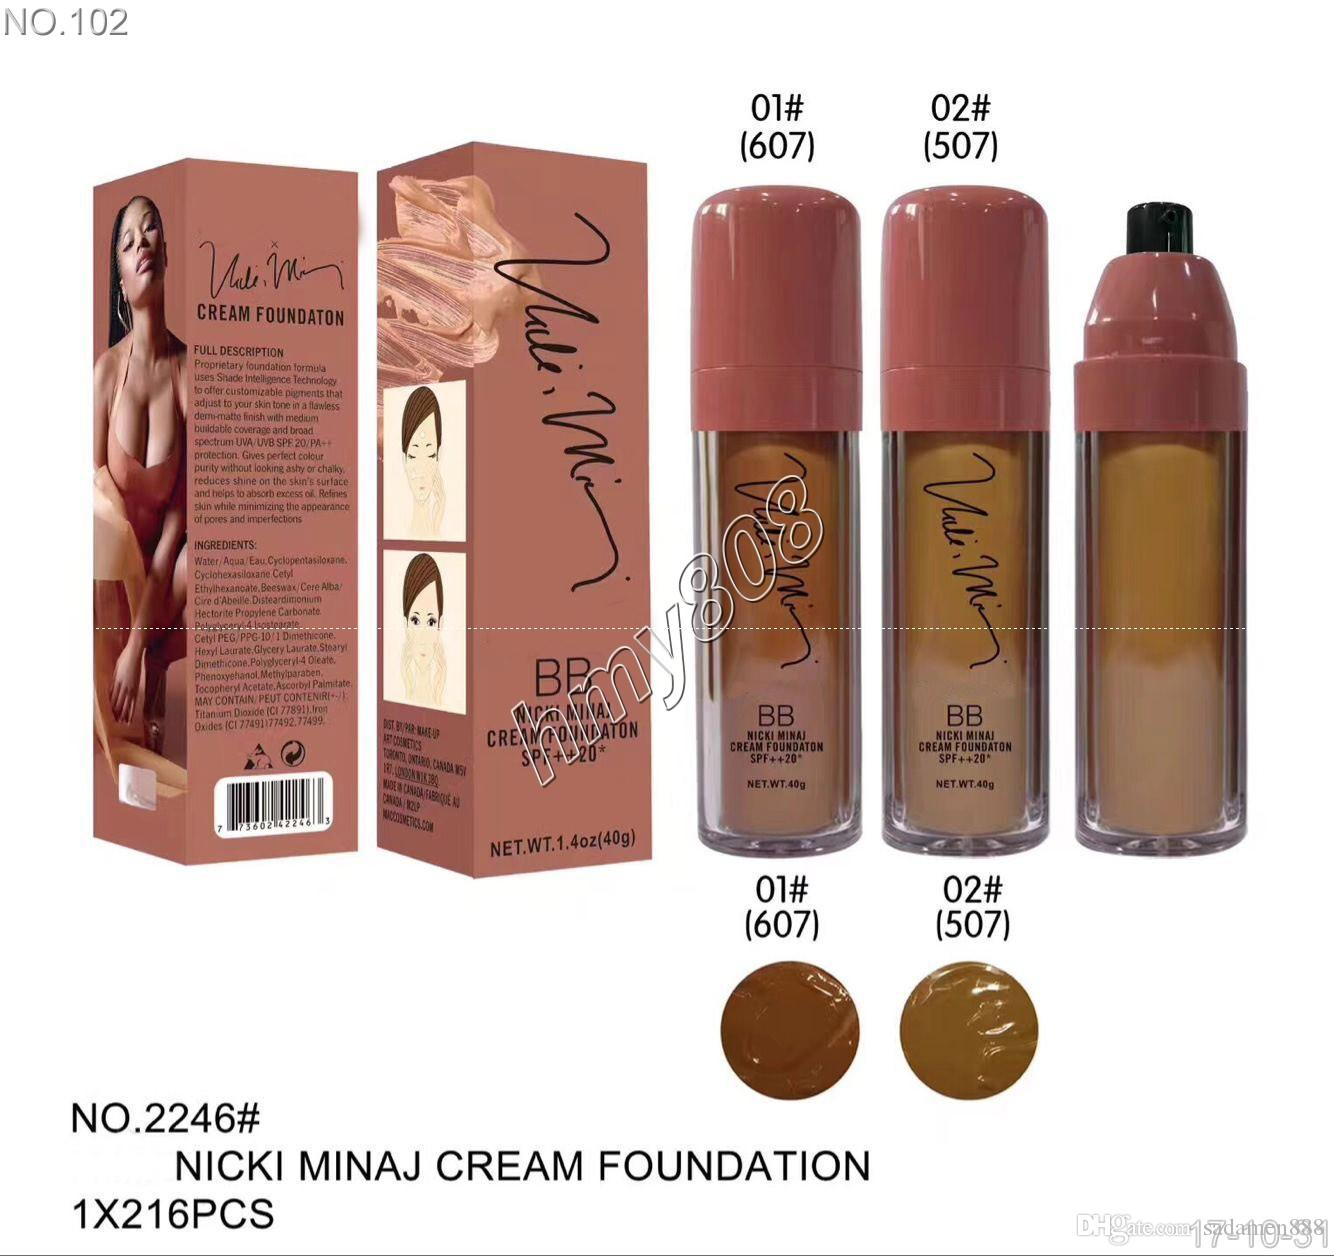 NEW Makeup BB Nicki Minaj Cream Foundation SPF++20 Waterproof Face Powder Foundation Liquid